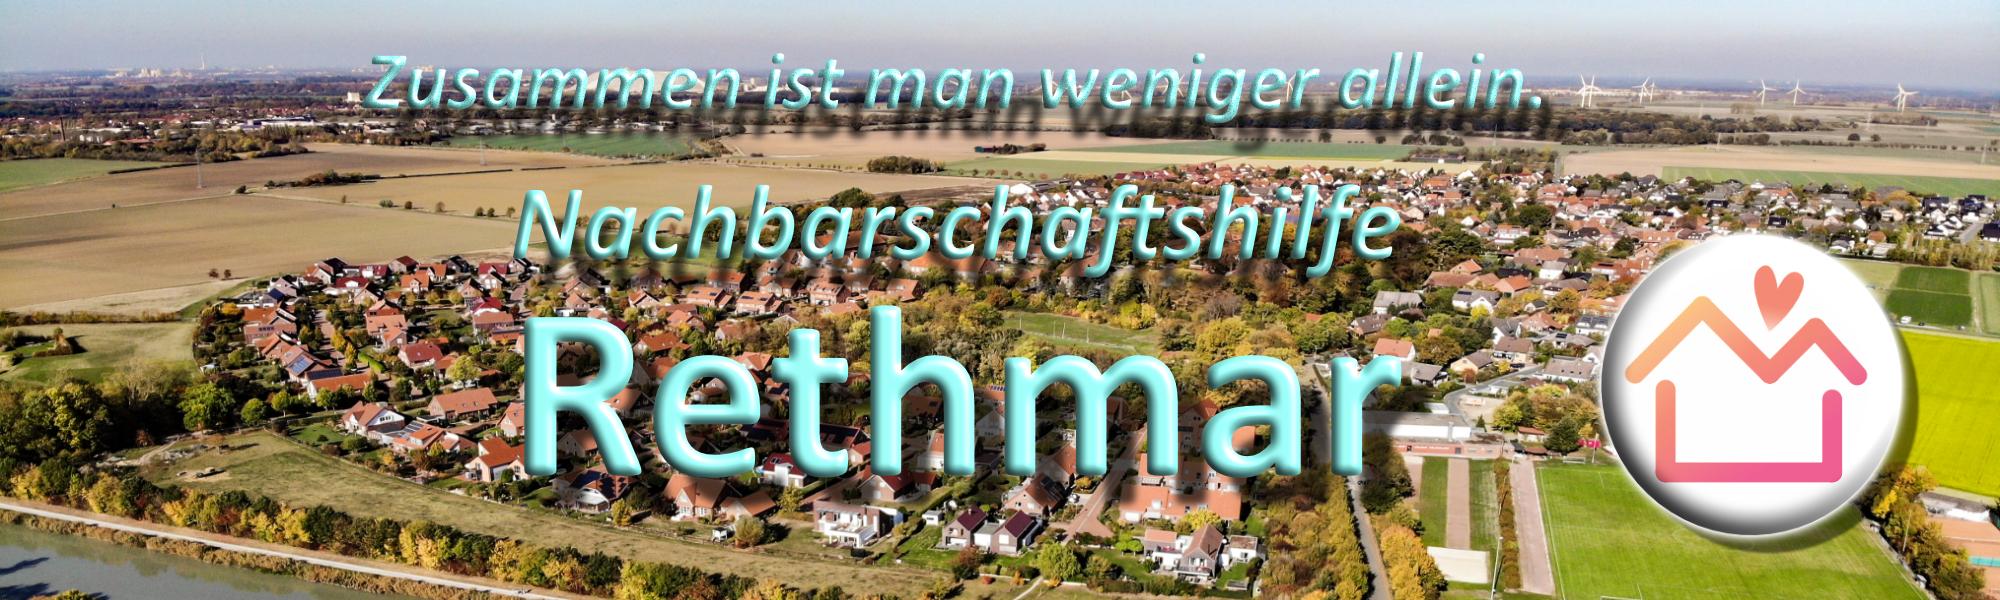 Nachbarschaftshilfe Rethmar